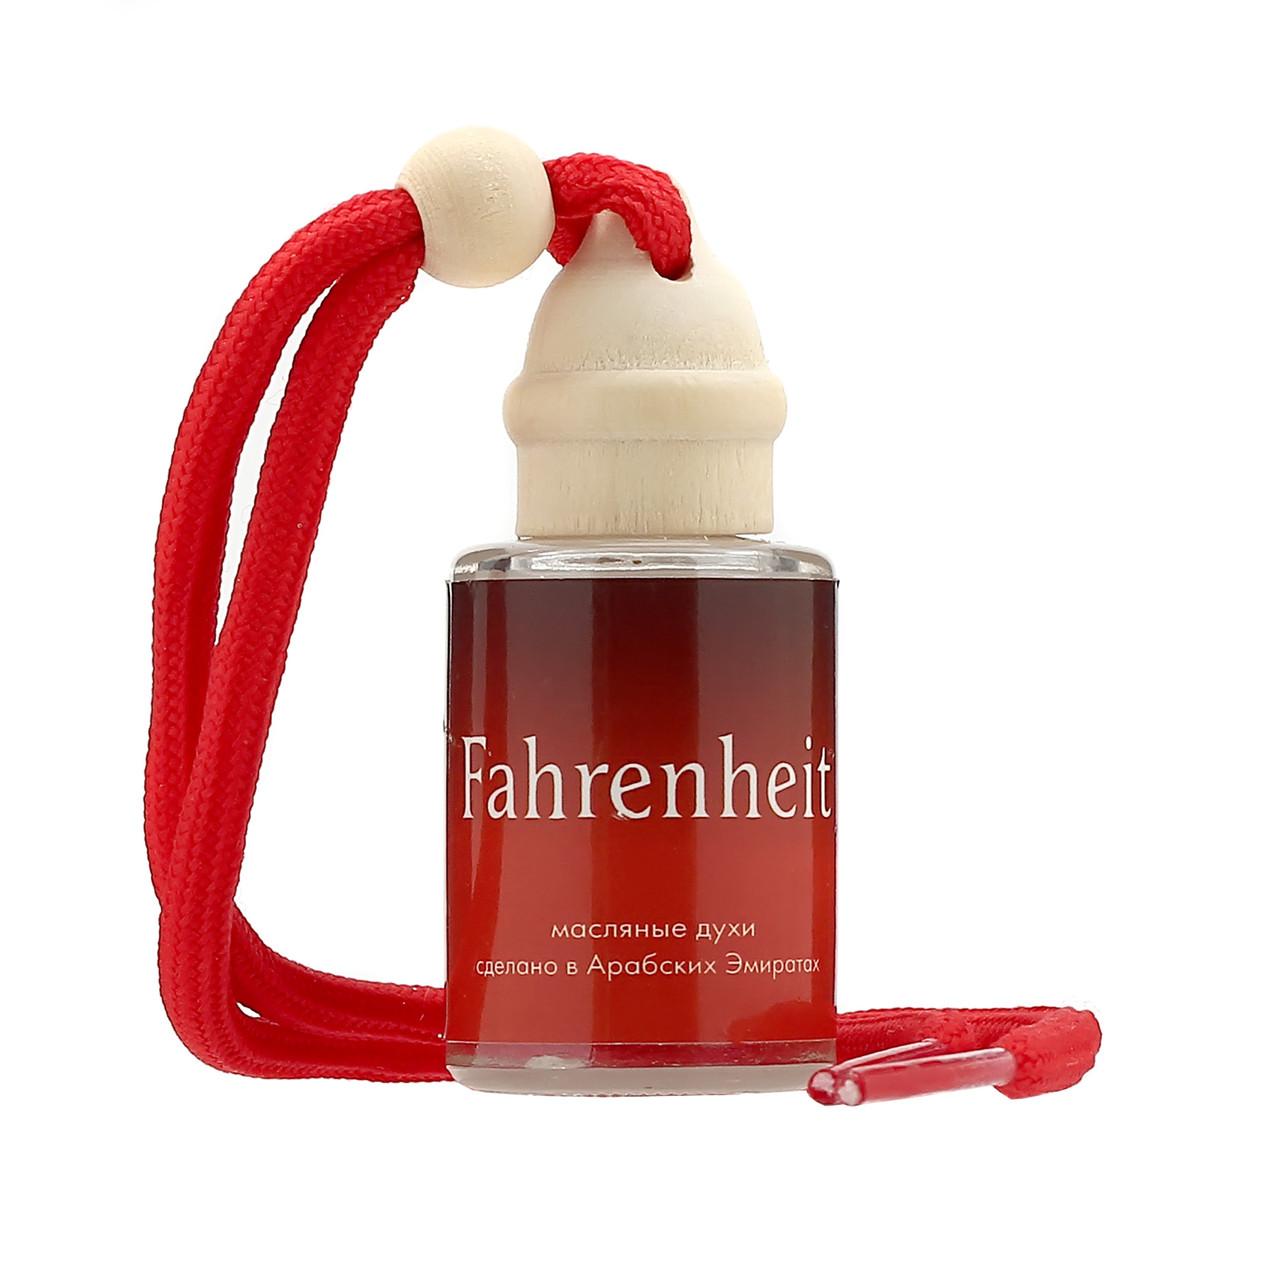 Автопарфюм Christian Dior Fahrenheit, 12 мл